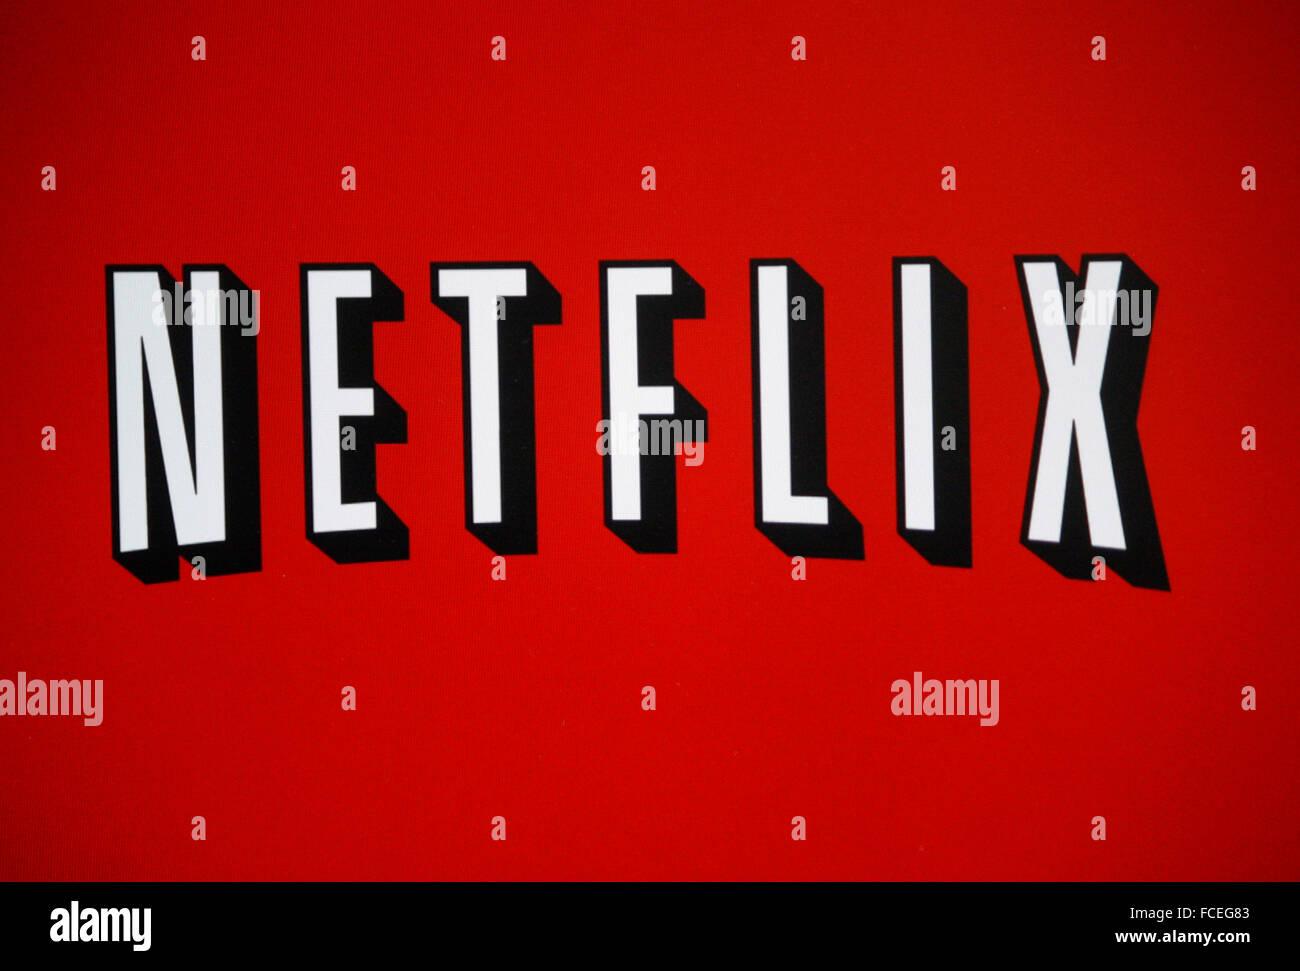 "Markenname: 'Netflix"", Berlin. Photo Stock"